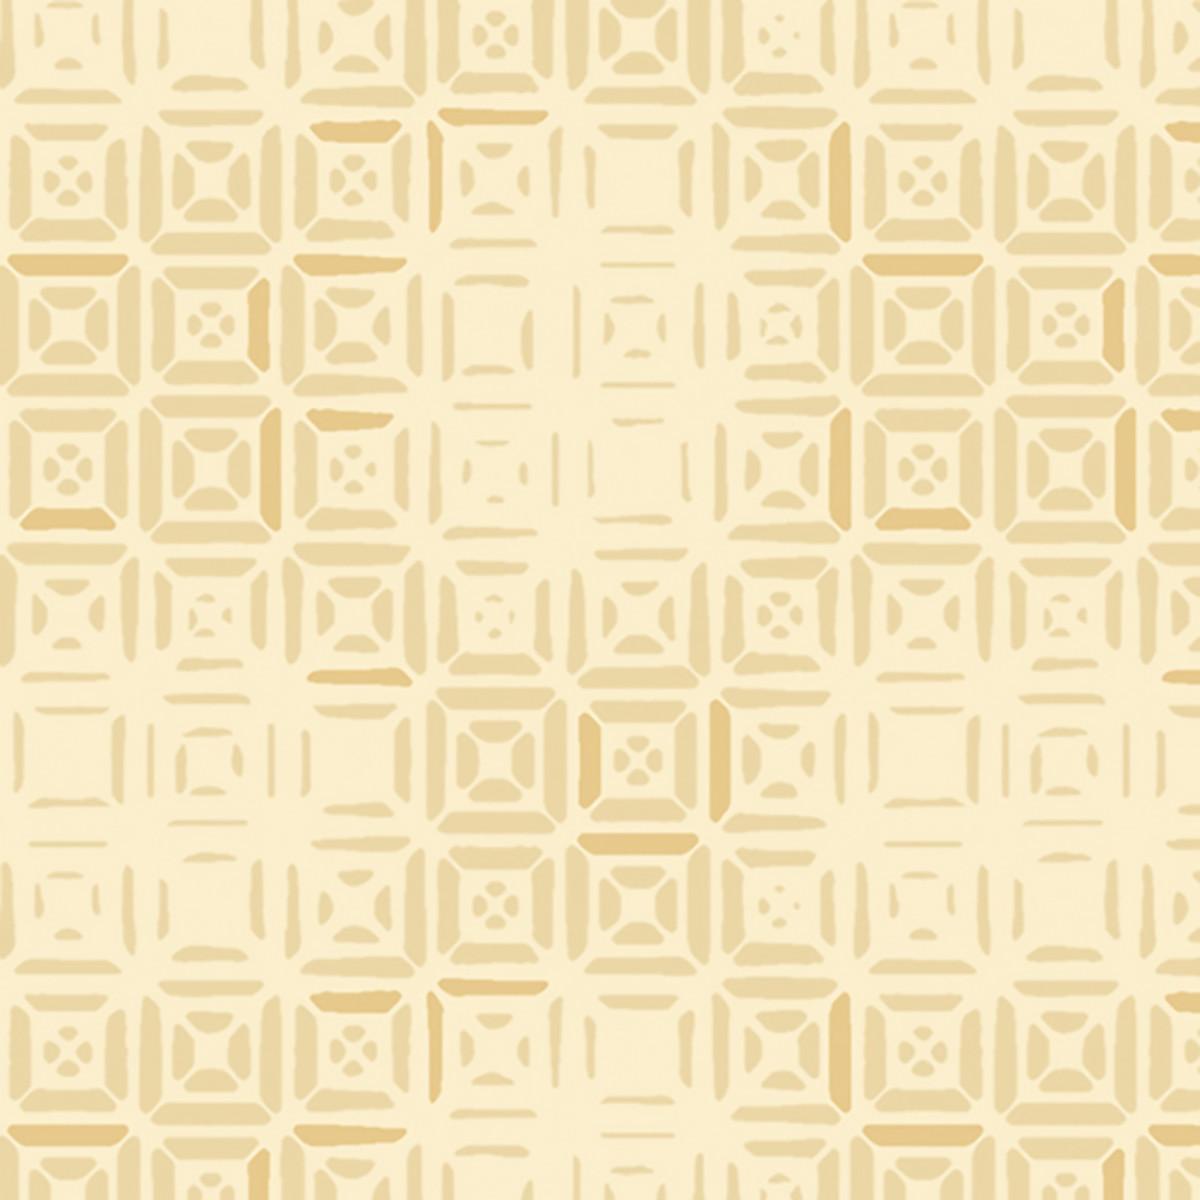 Обои виниловые Shinhan Wallcoverings бежевые 1.06 м 88286-2